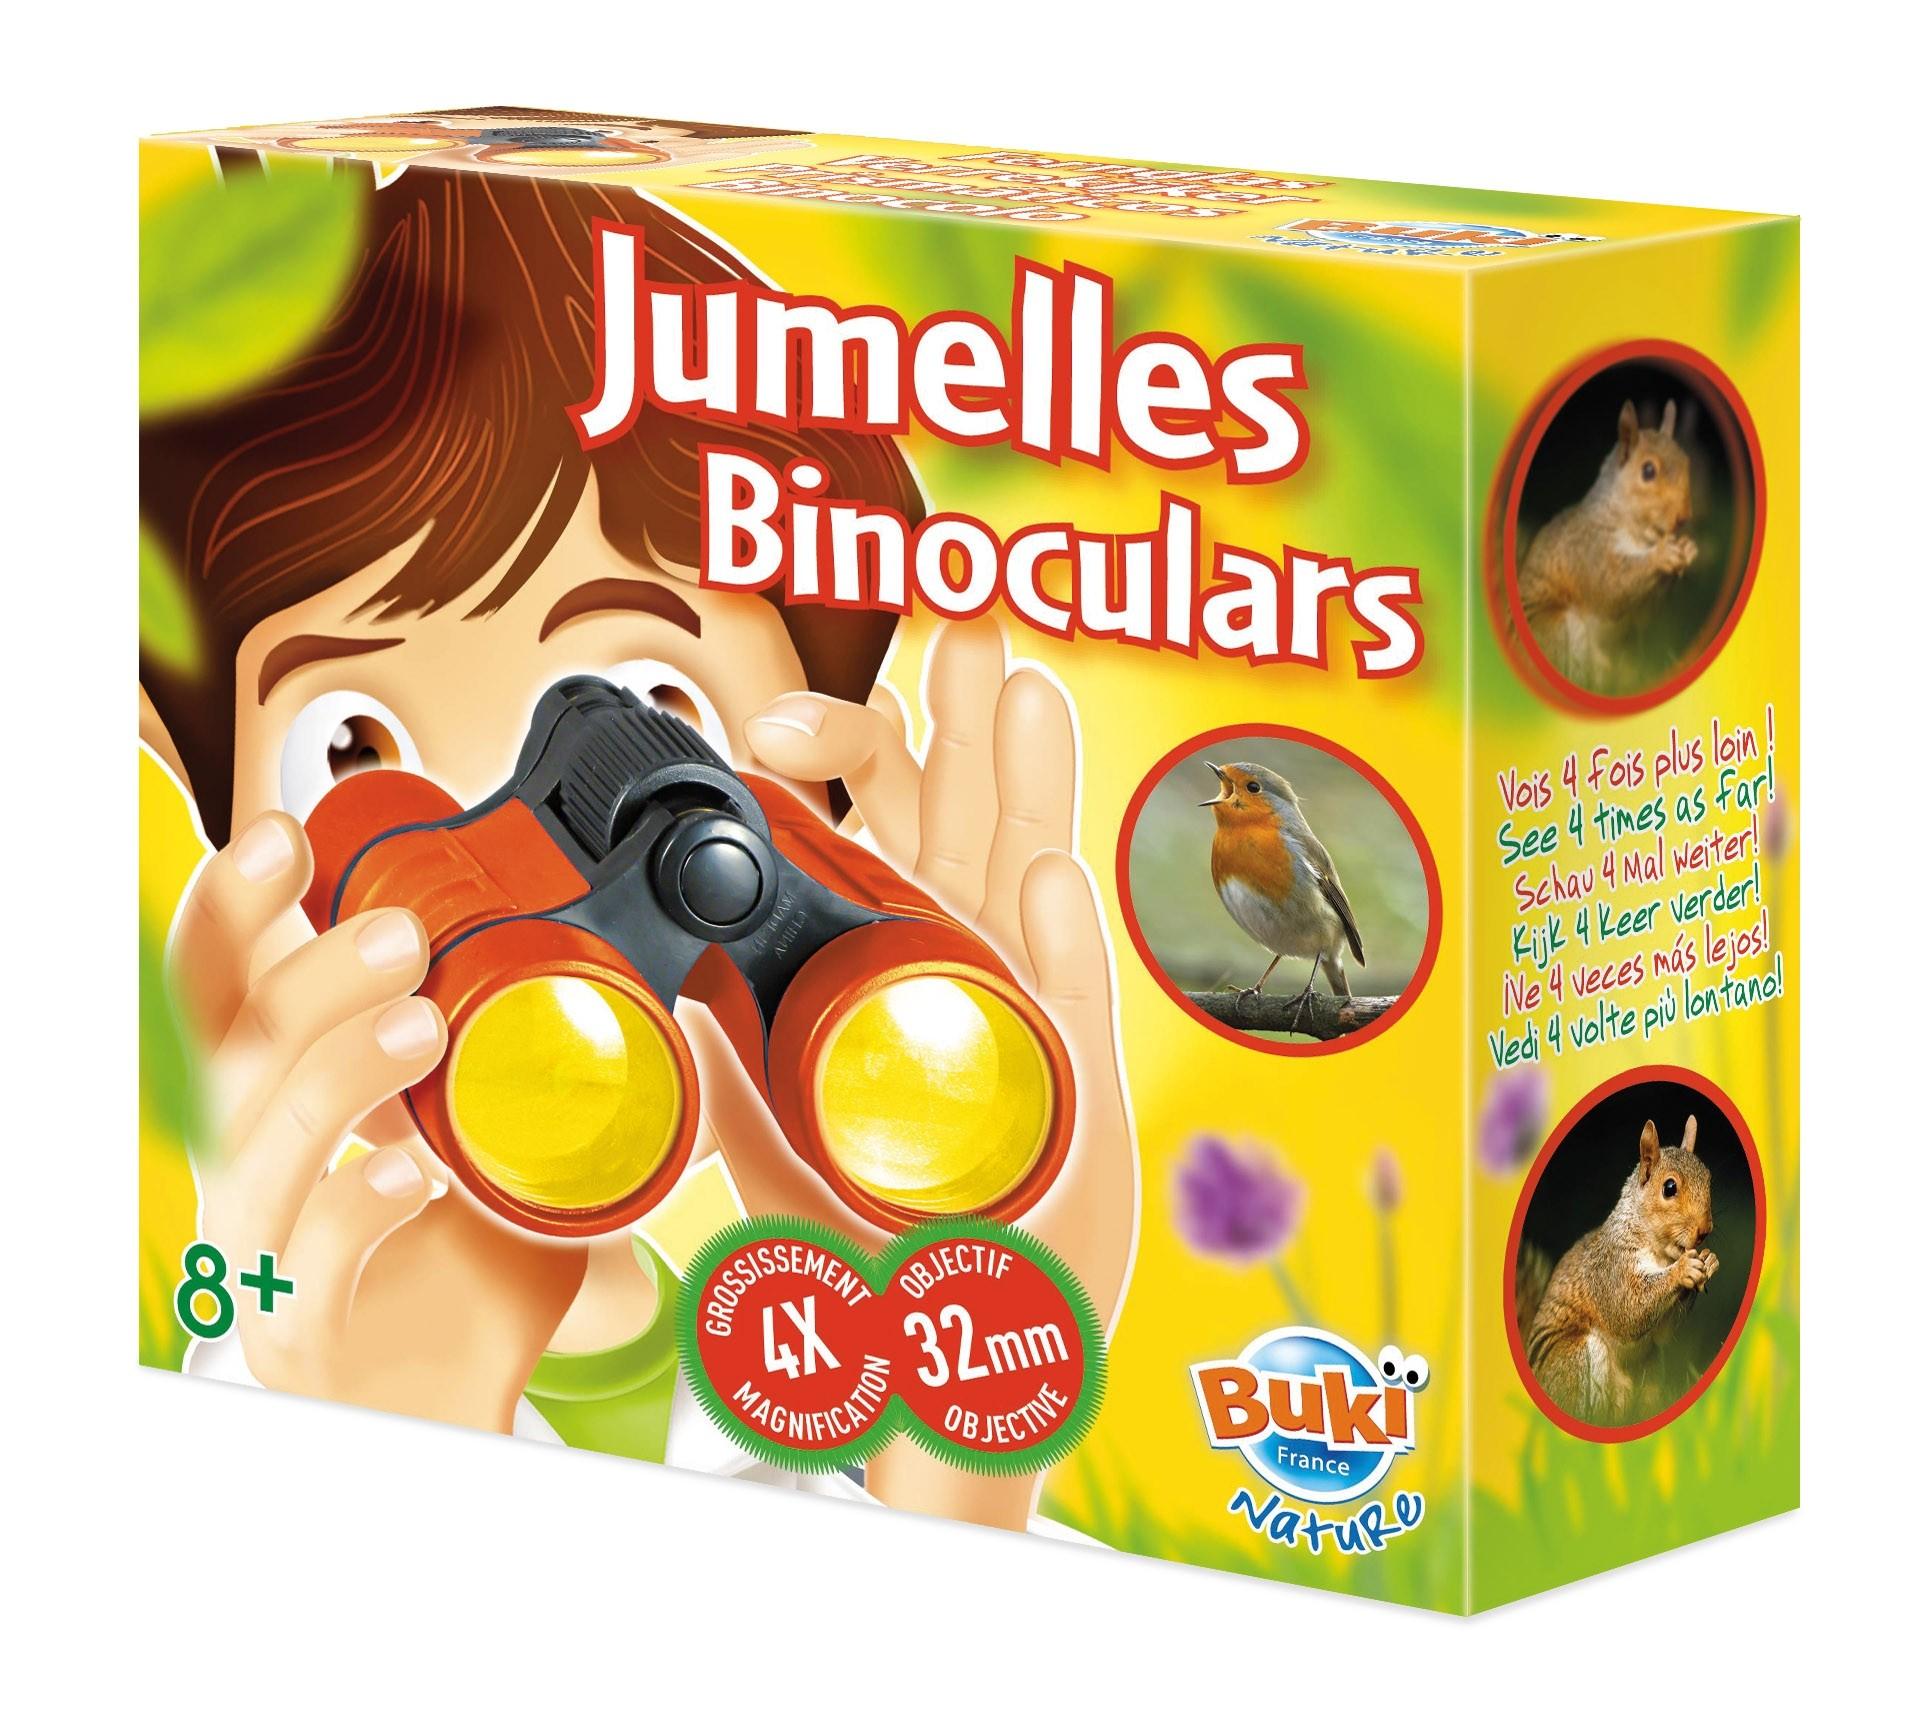 BUKI Nature Binoculars Kit